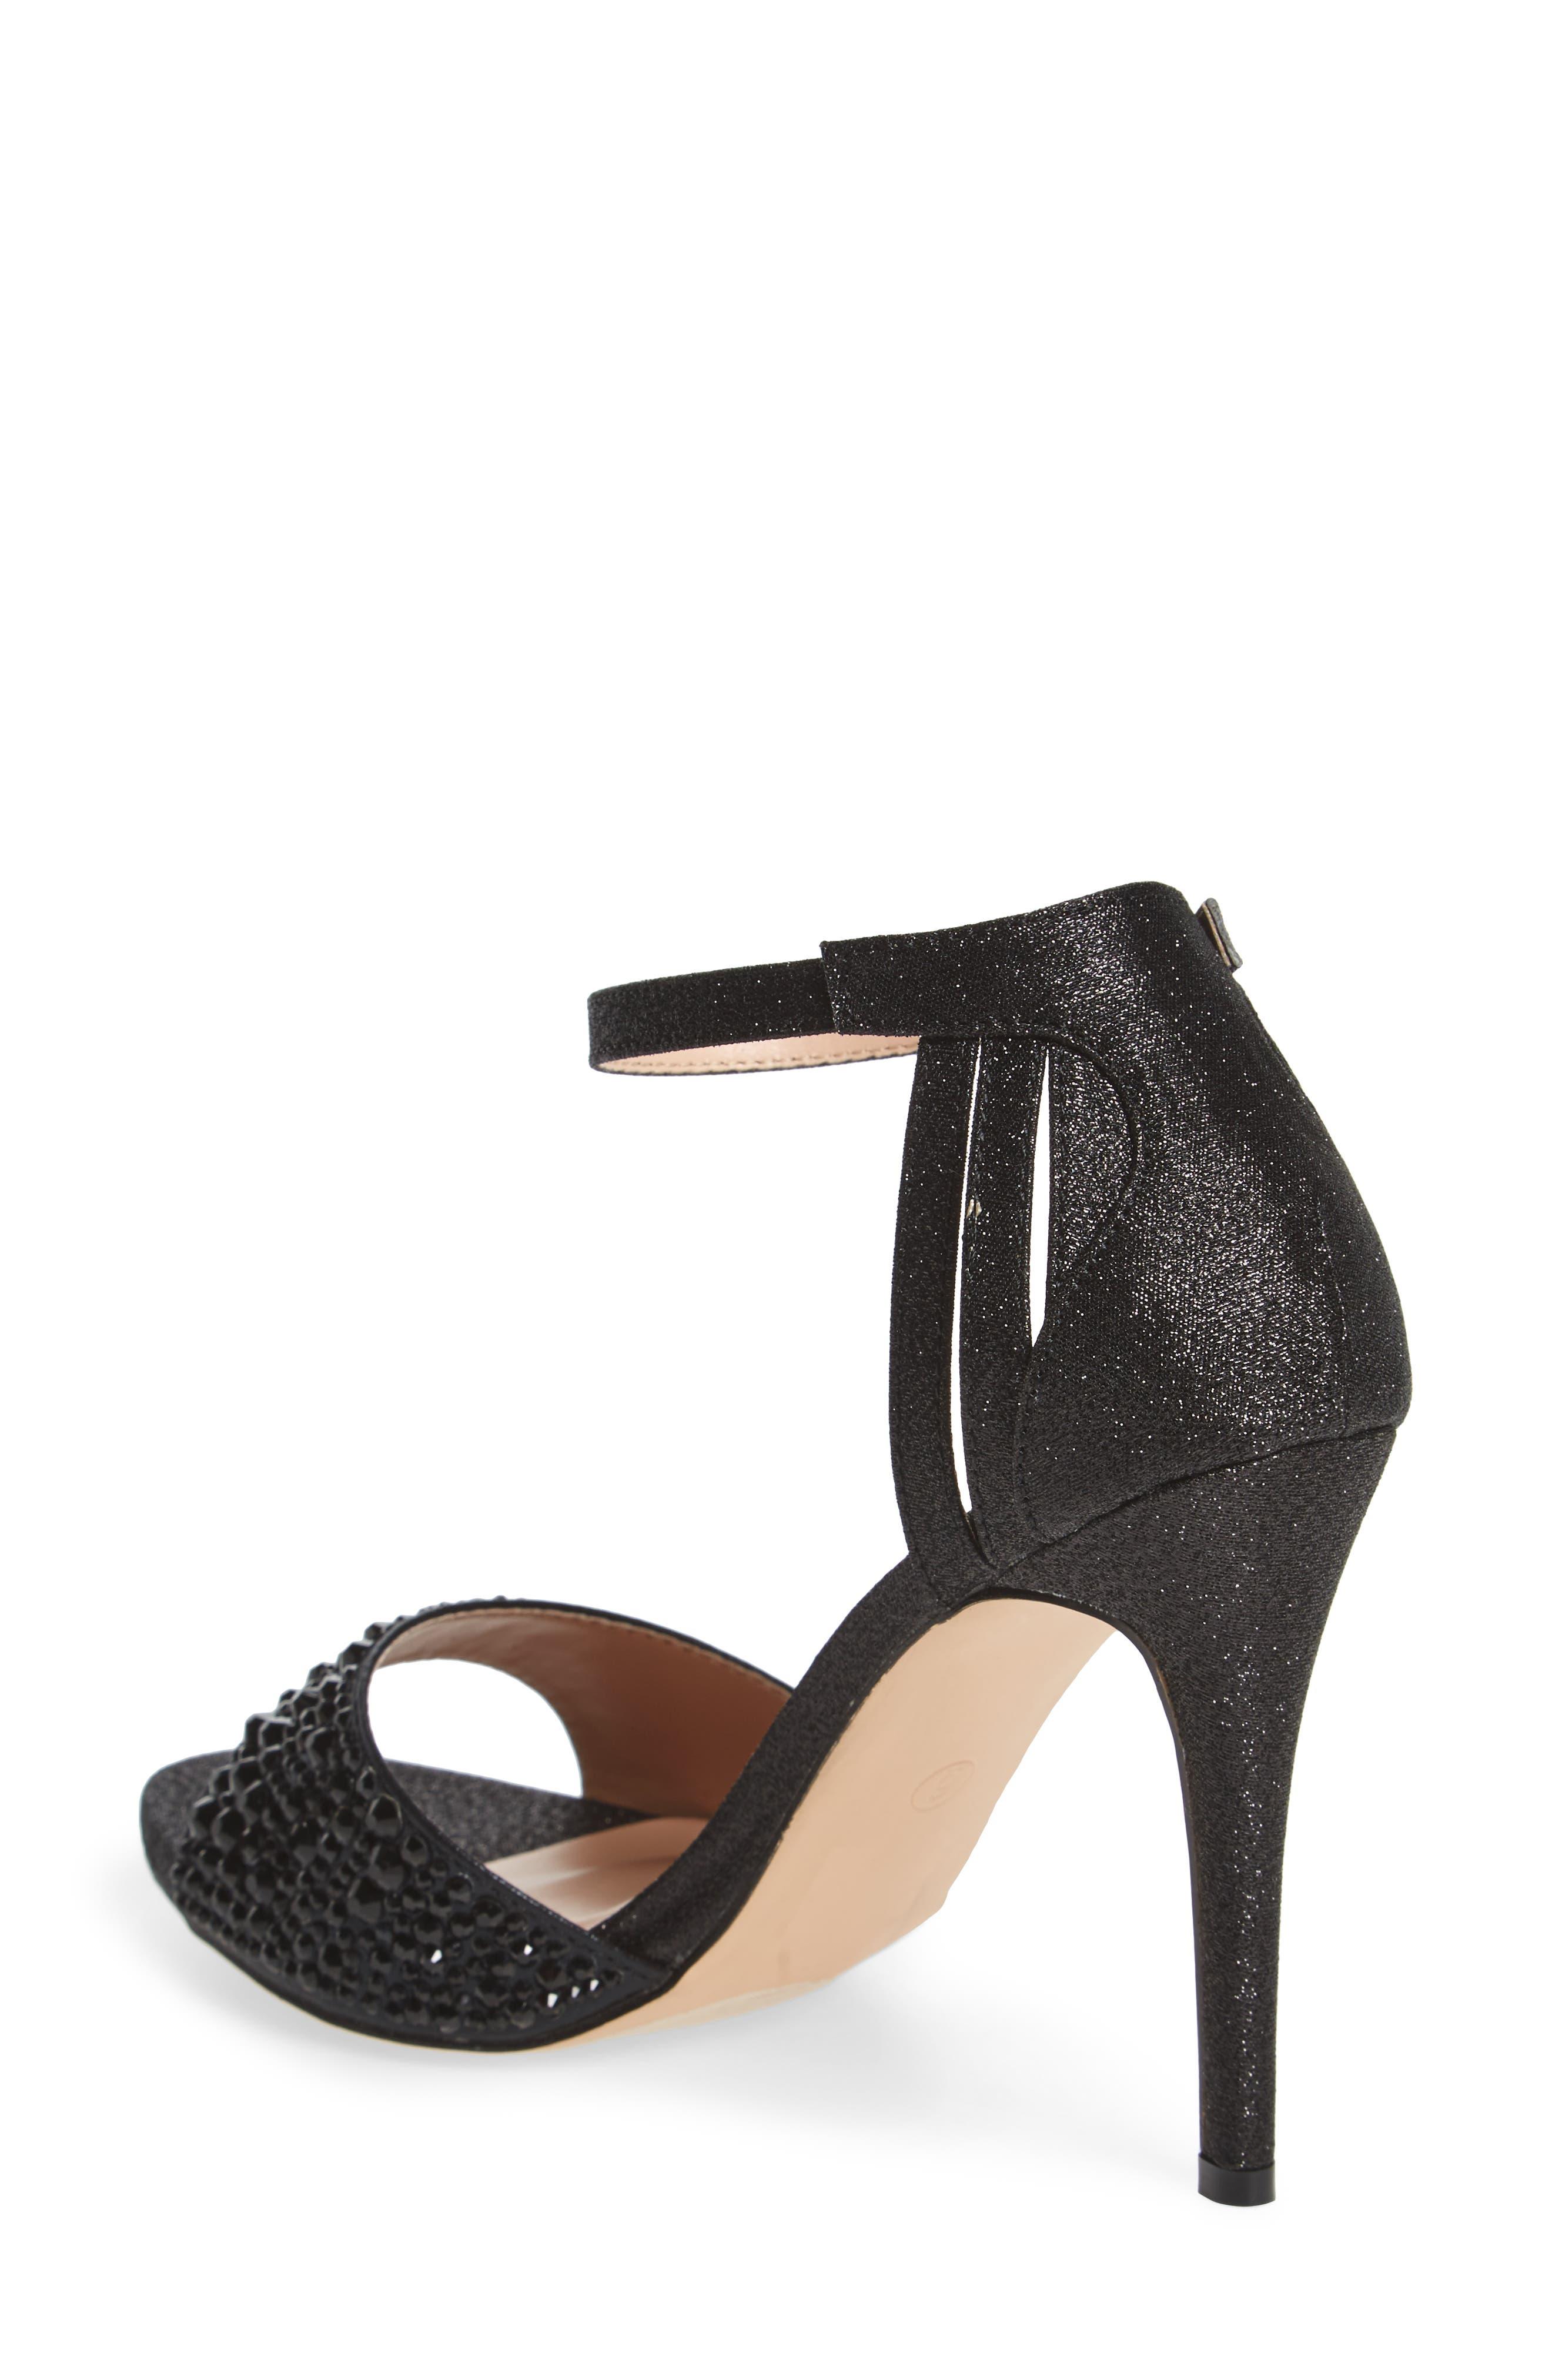 Alternate Image 2  - Lauren Lorraine Maddy Embellished Sandal (Women)